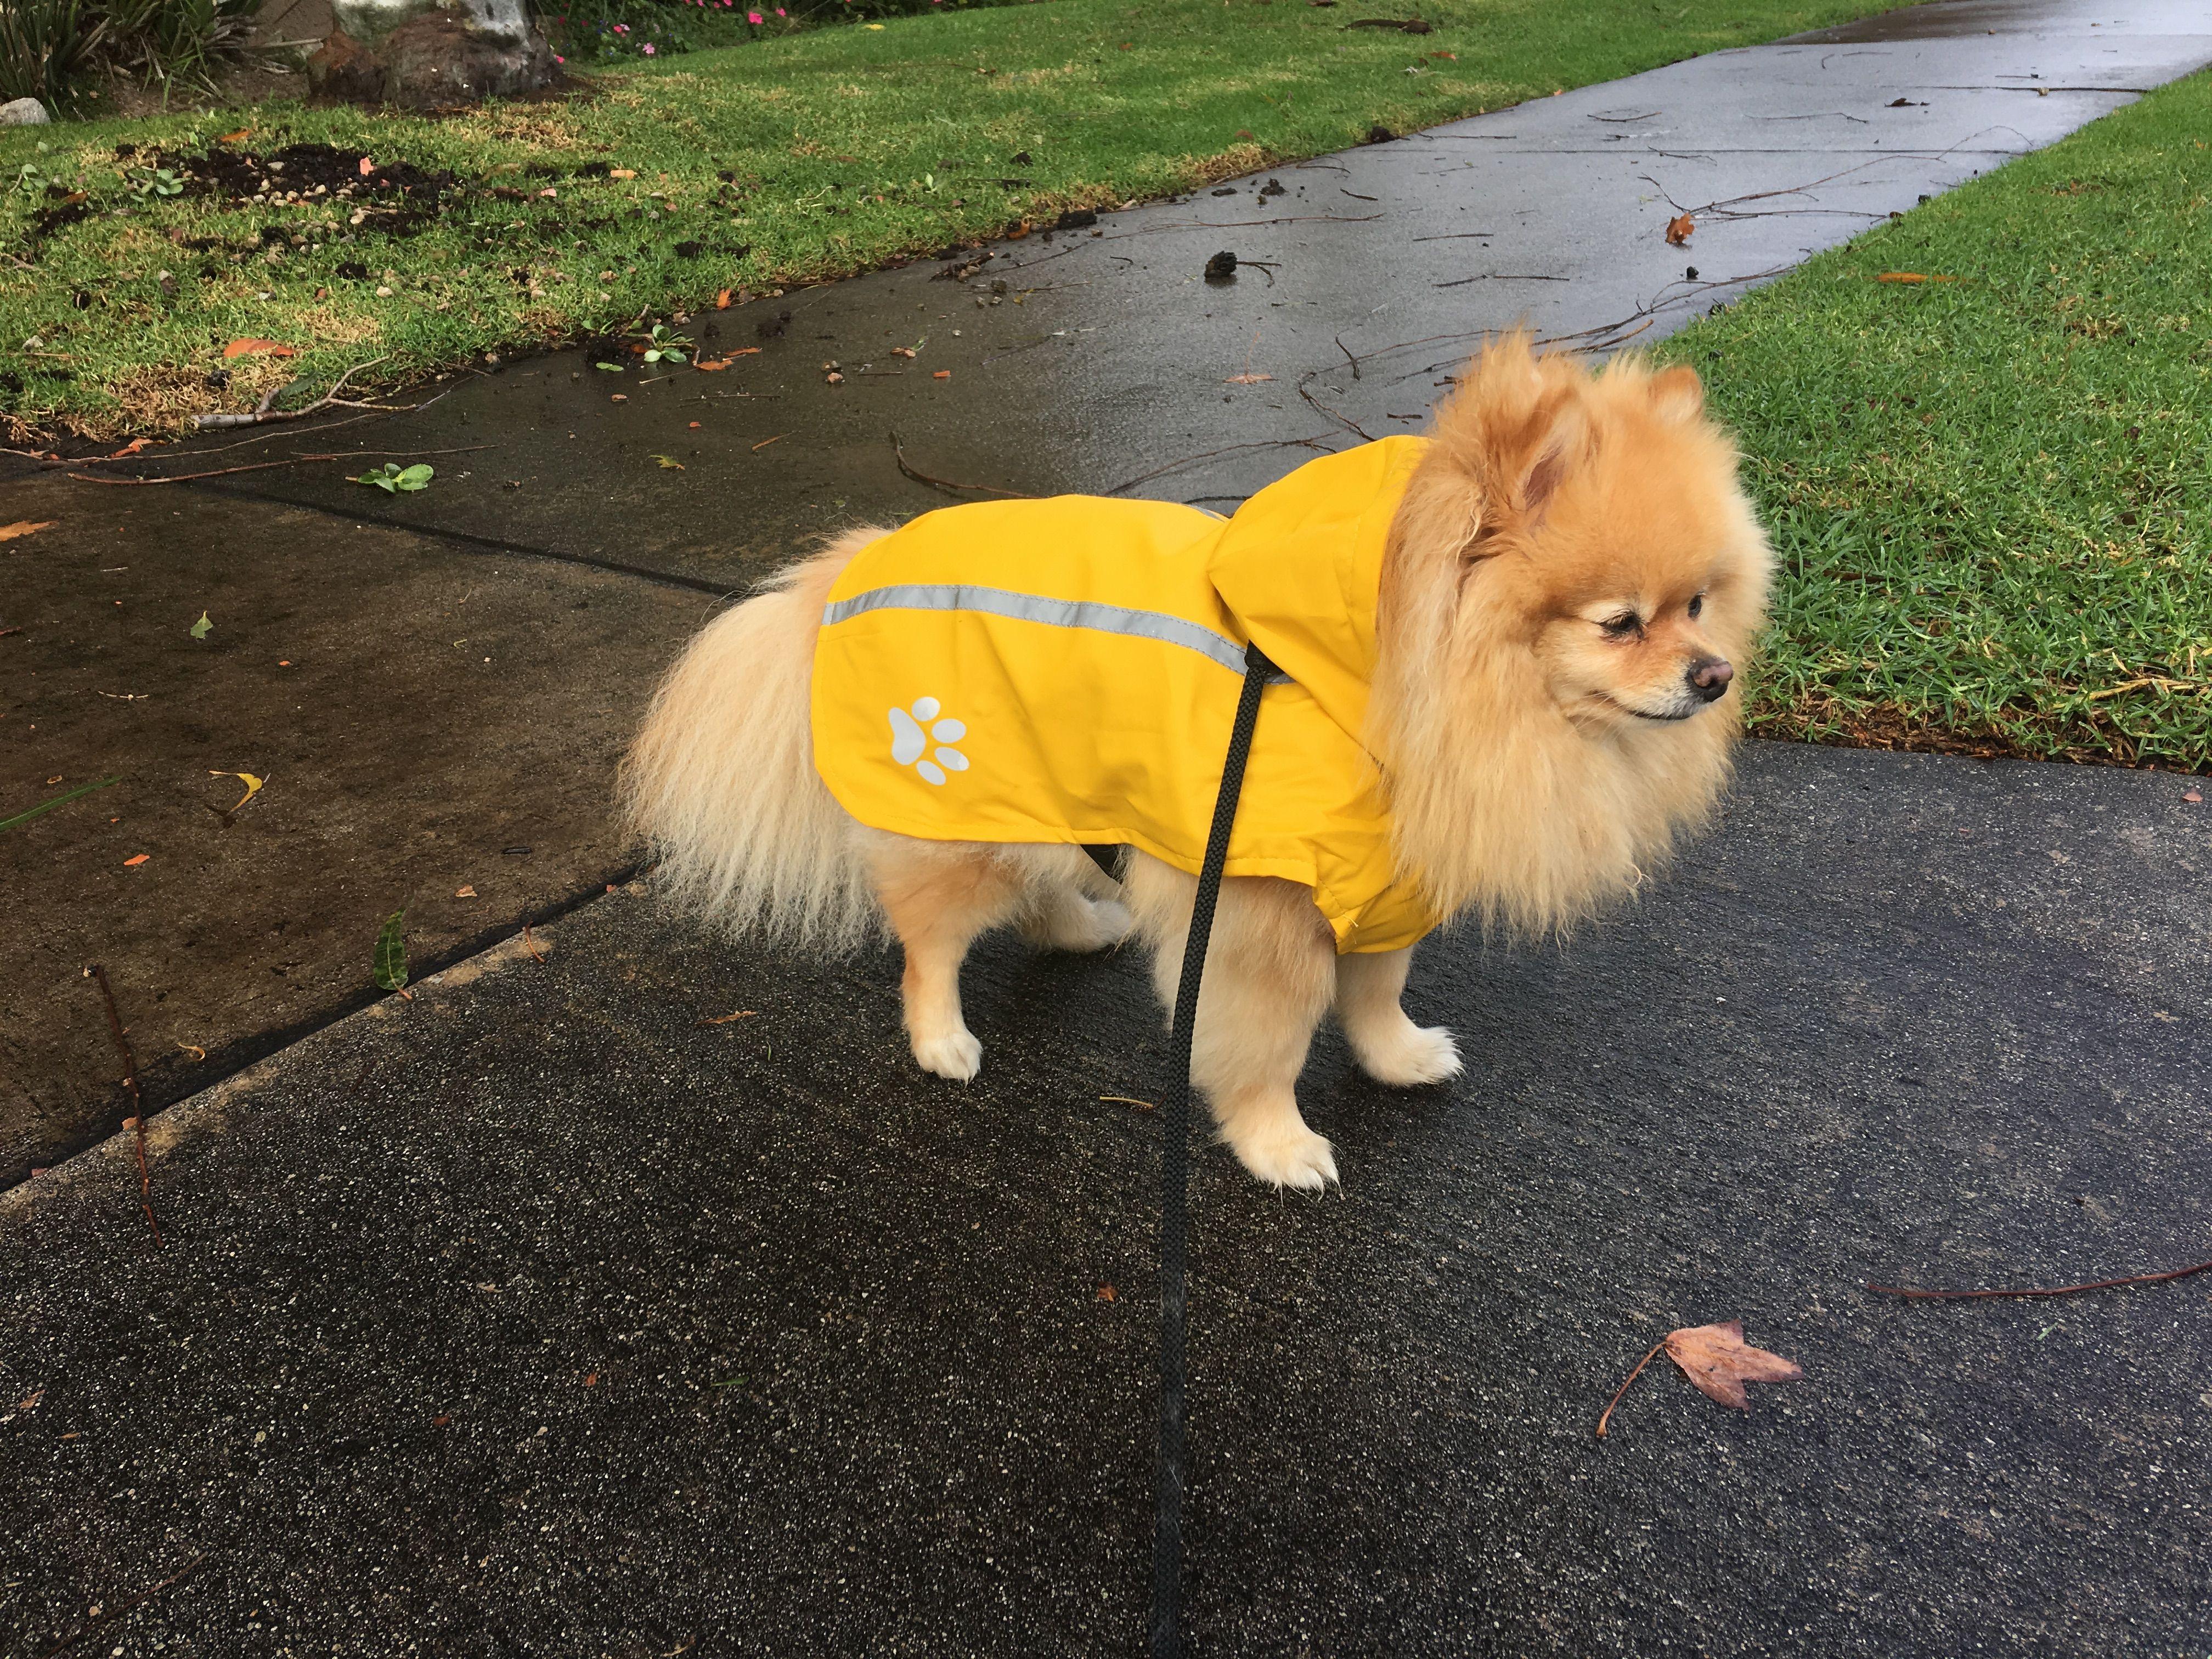 lola u0027s new raincoat from petsmart pomeranian lola the